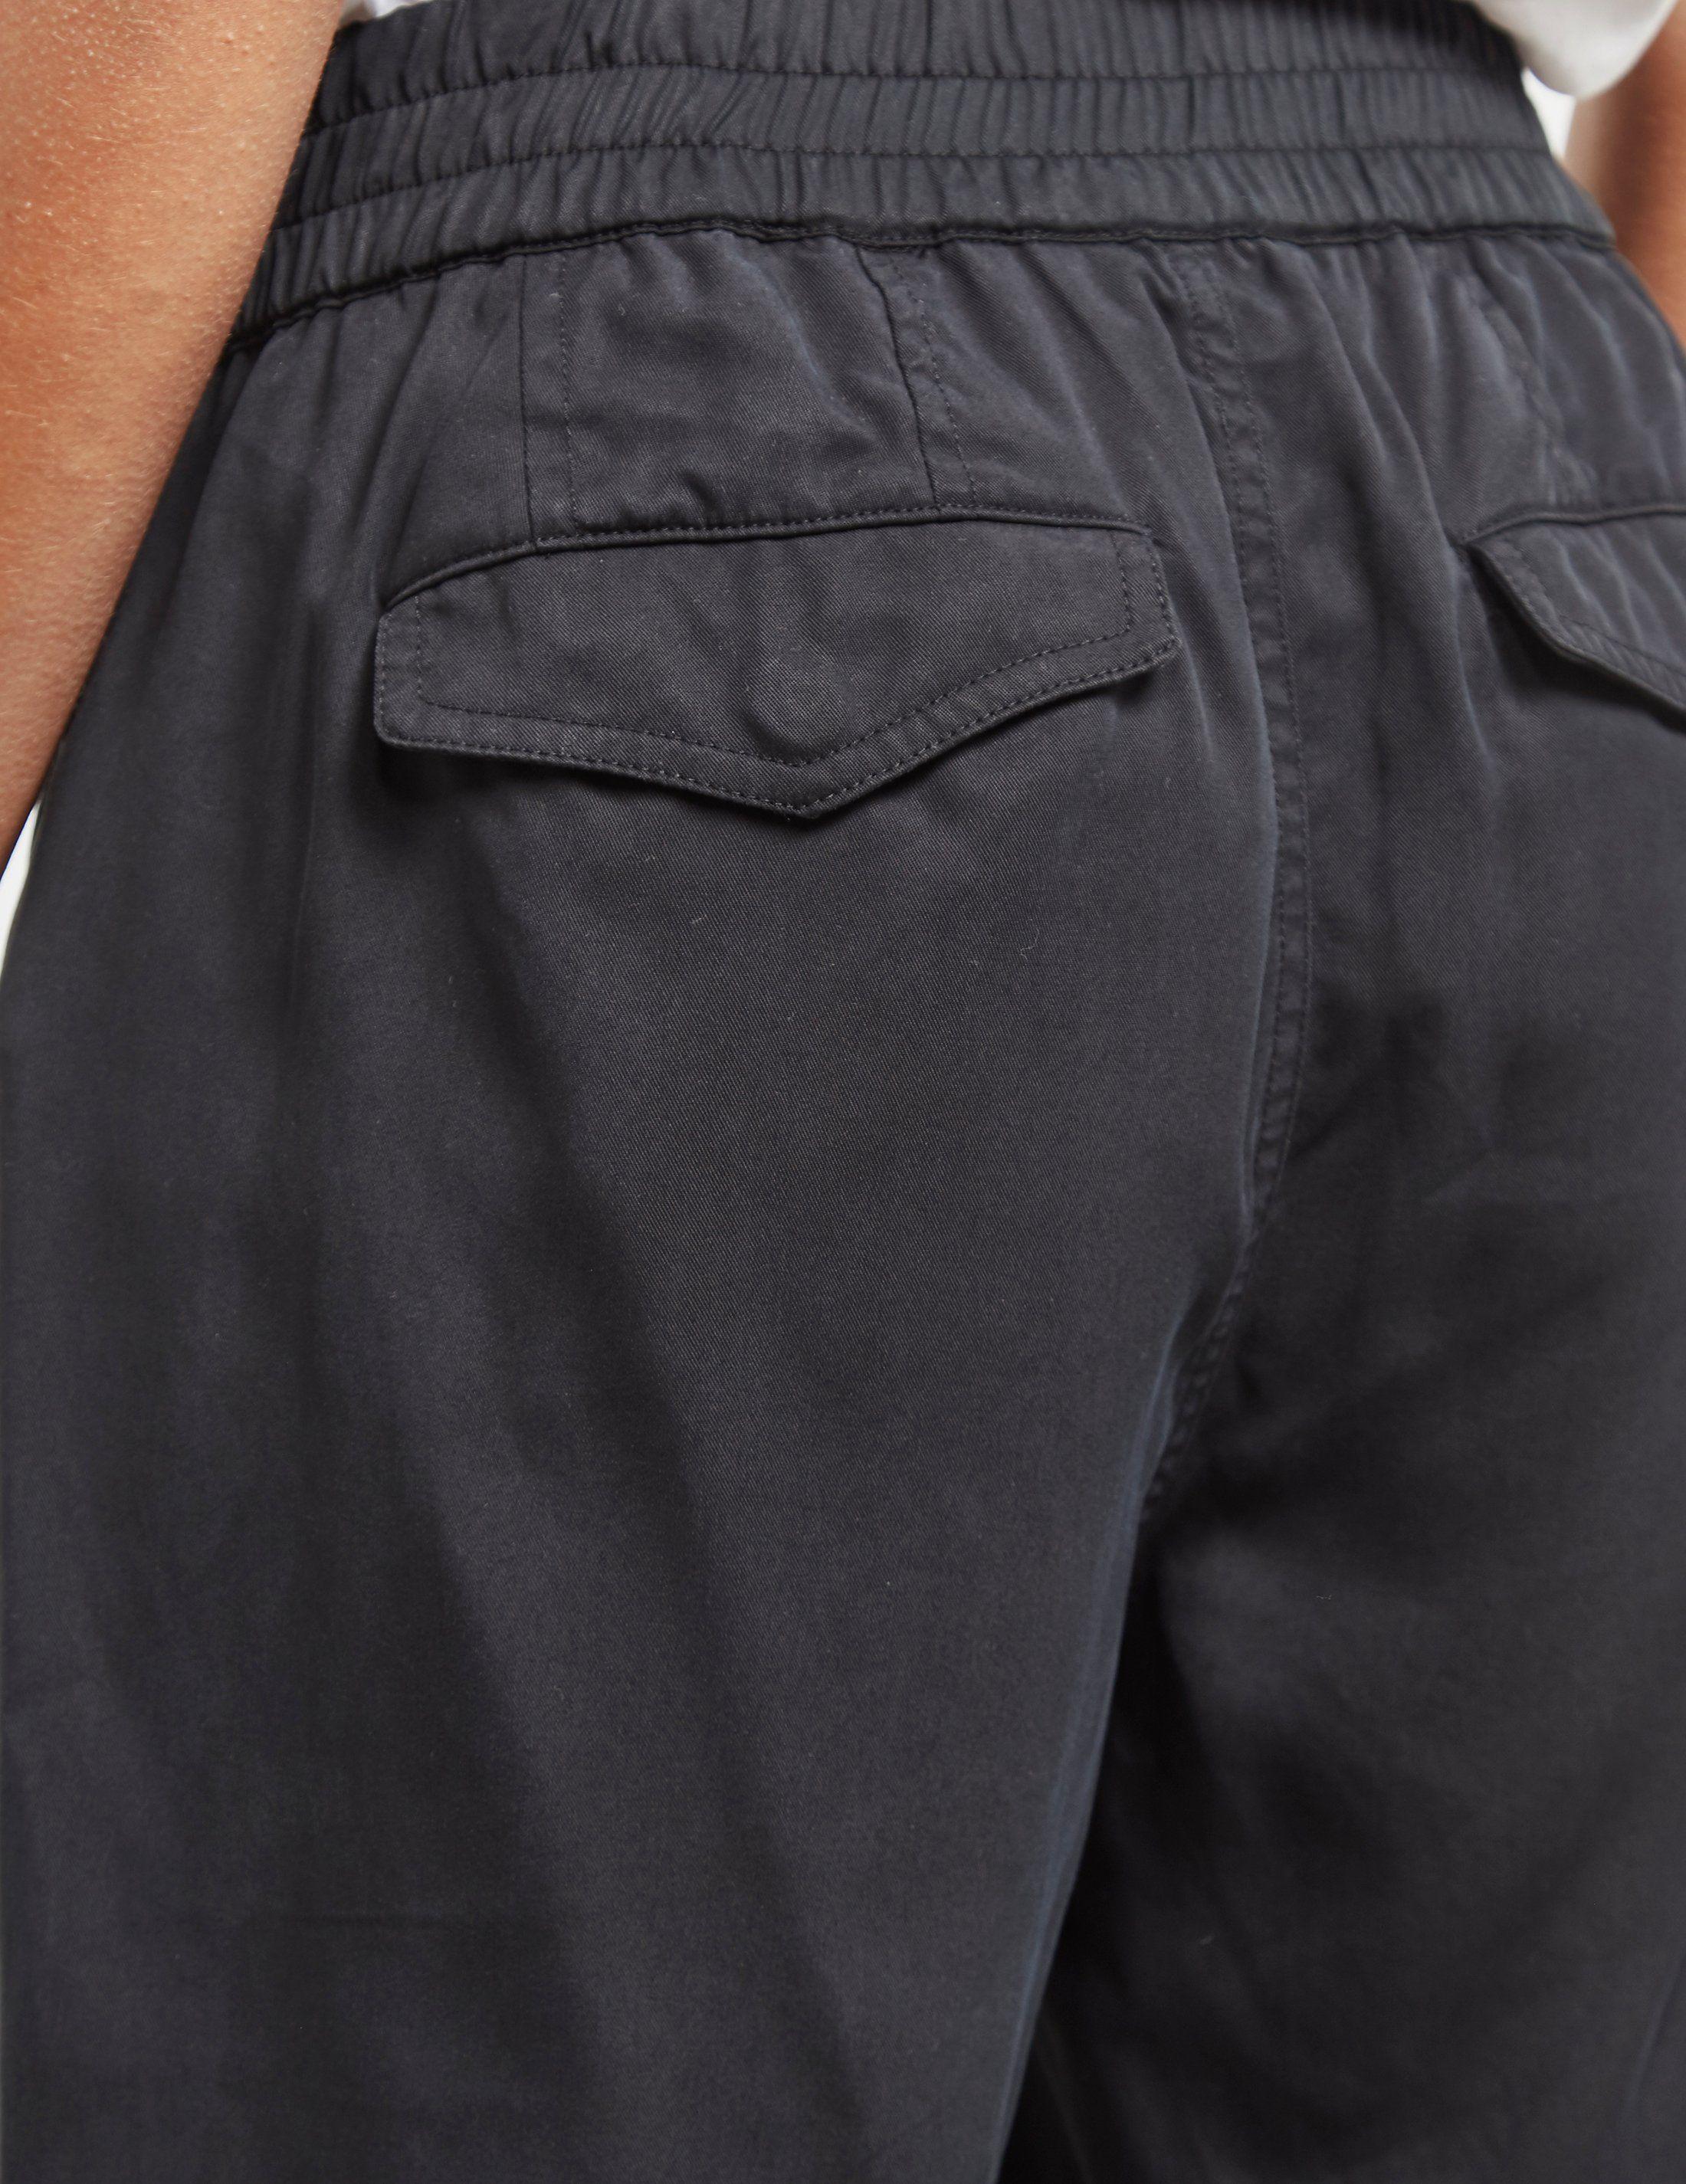 Polo Ralph Lauren Crepe Trousers - Online Exclusive